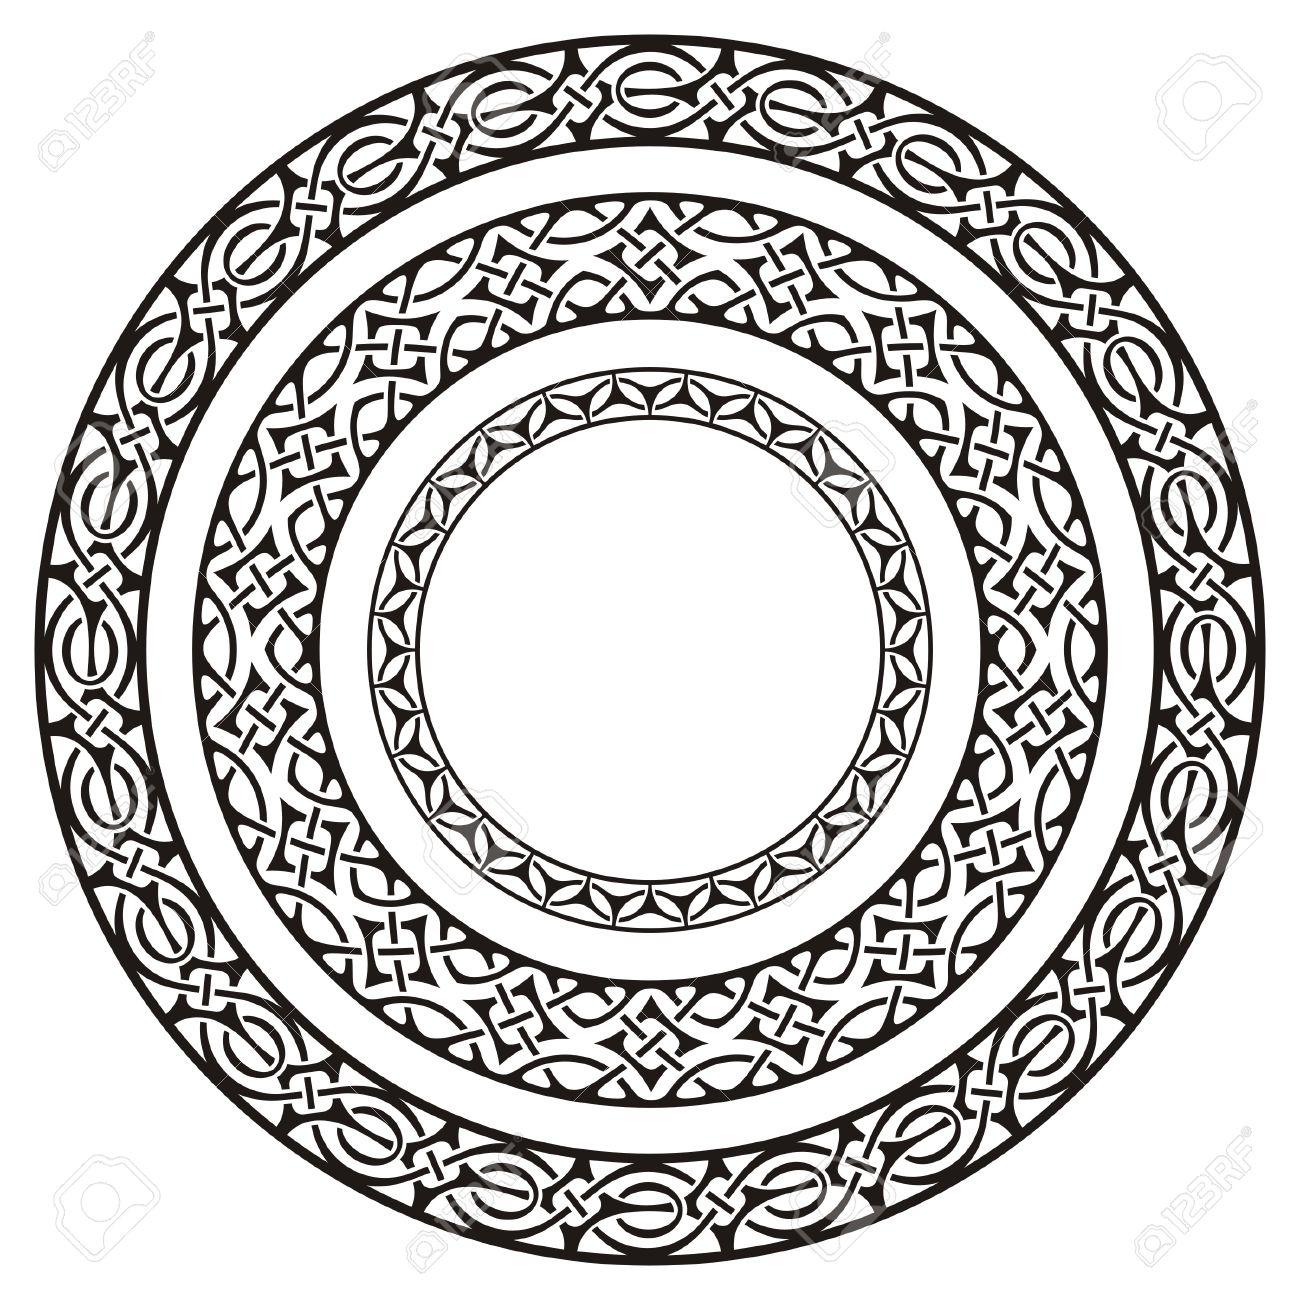 Circle Frames Royalty Free Cliparts, Vectors, And Stock Illustration ...